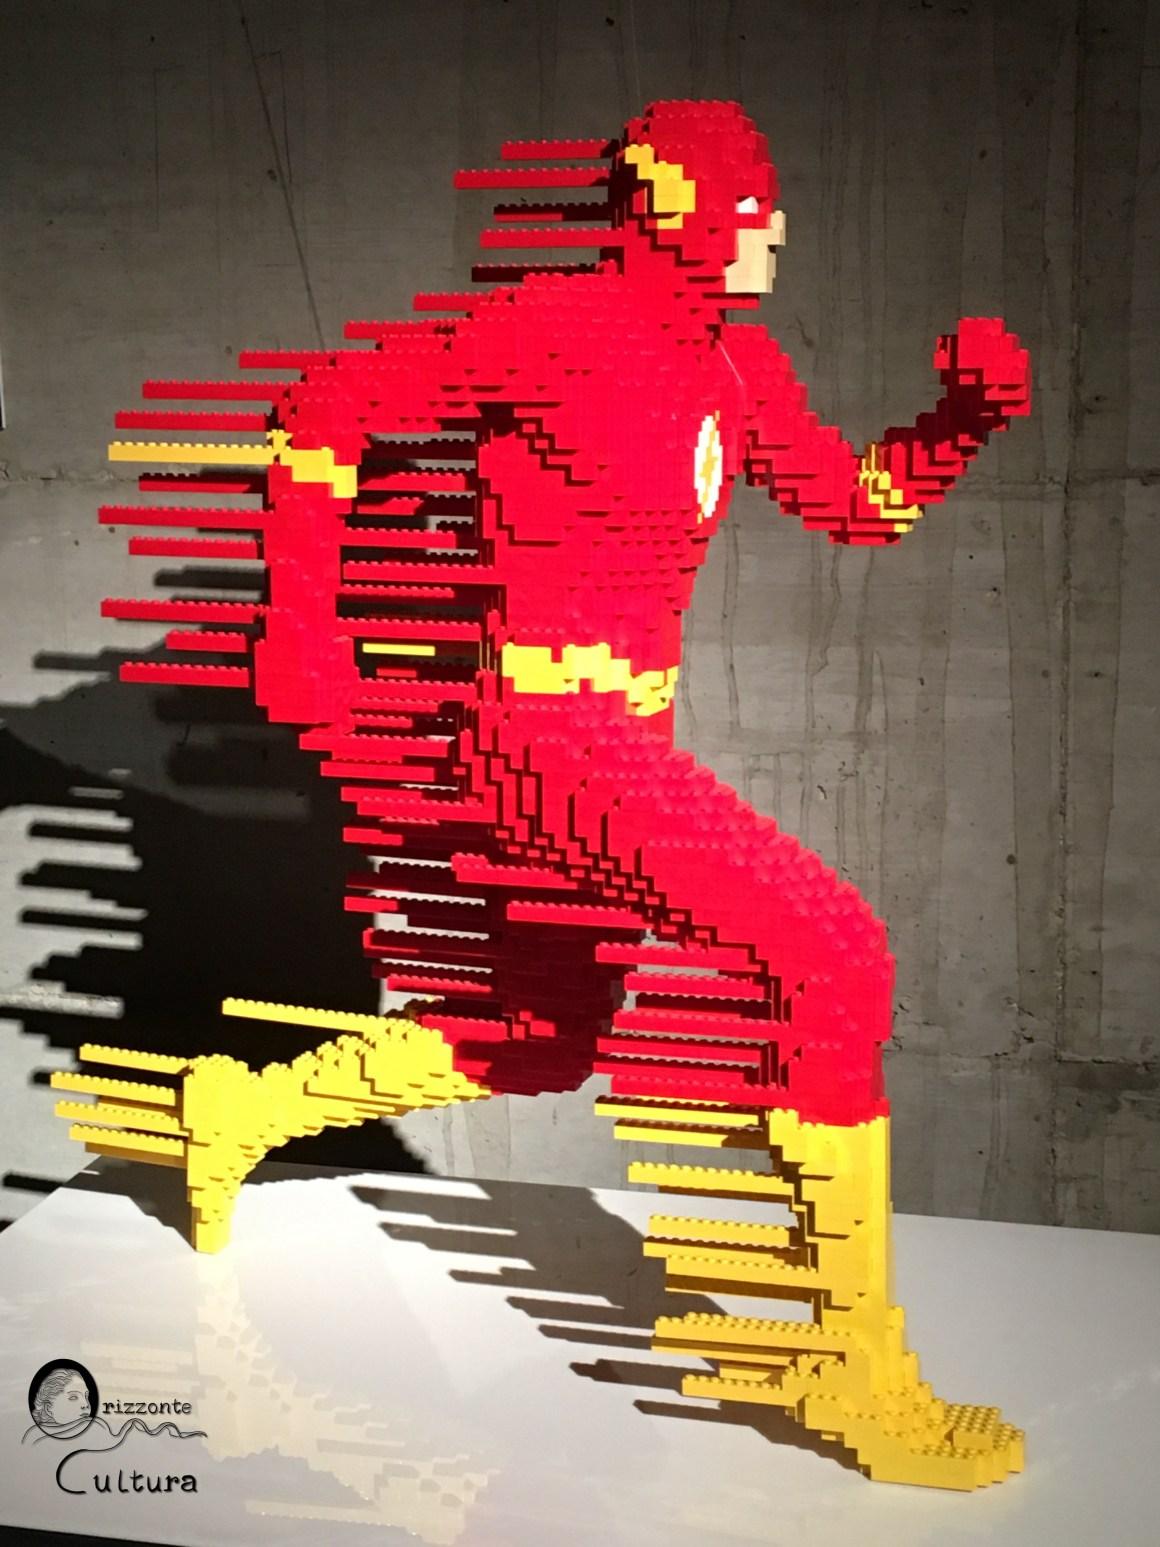 THE ART OF THE BRICK: DC SUPER HEROES - Orizzonte Cultura